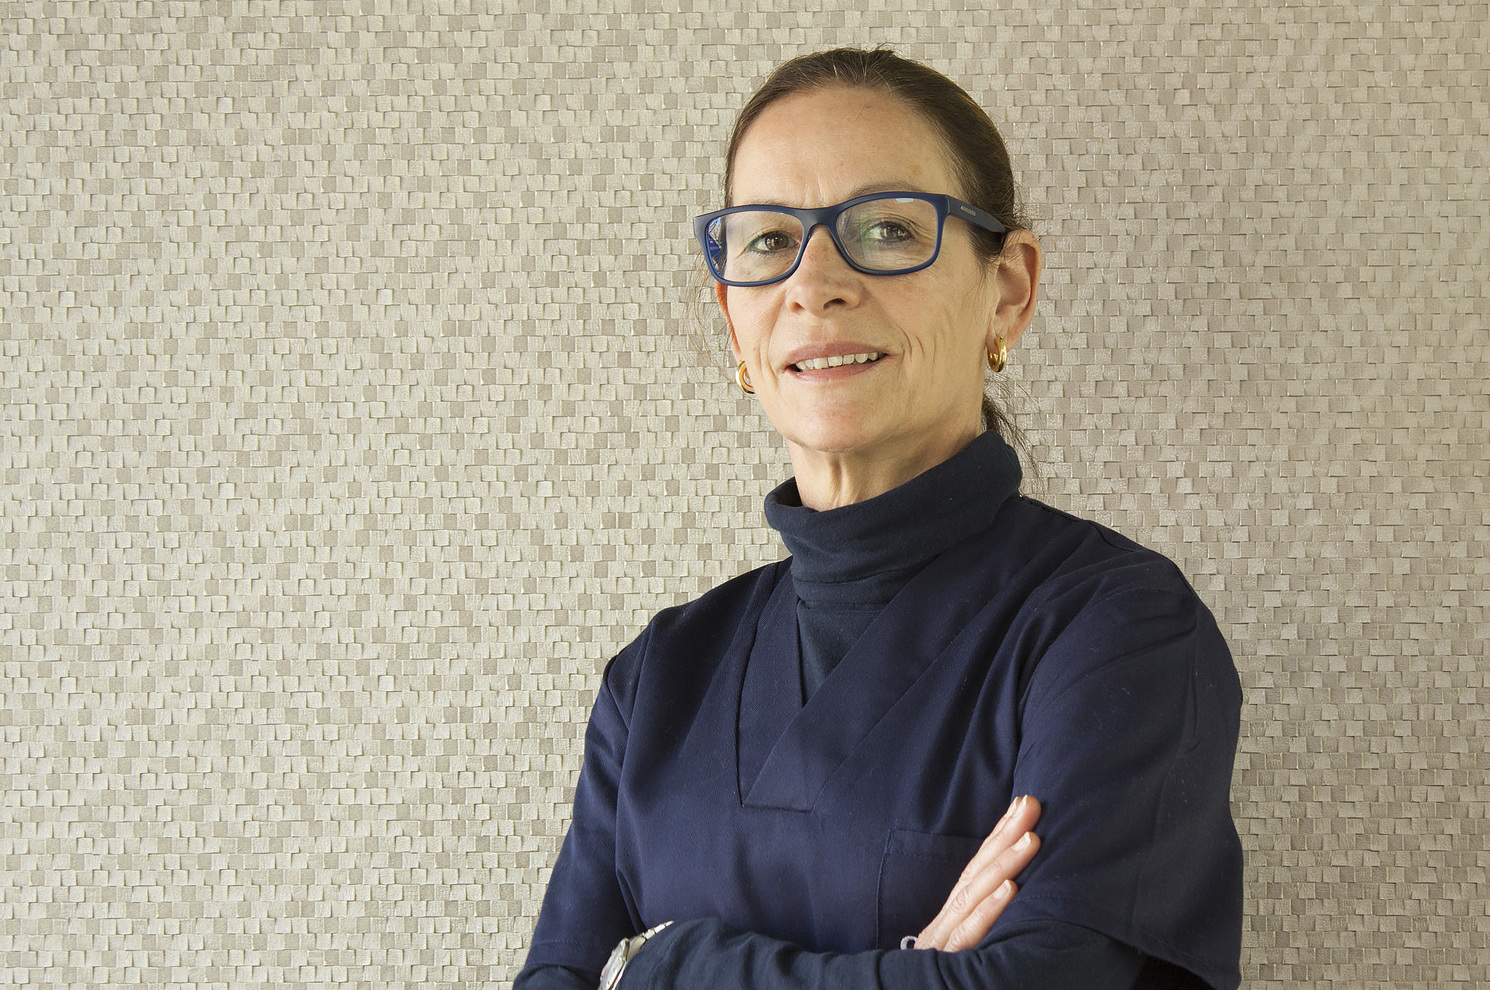 Dra. Enriqueta Pérez Ripollés  - Médico Estomatólogo,  Ortodoncia, Especialista Diamon Invisalign - Col. 2850